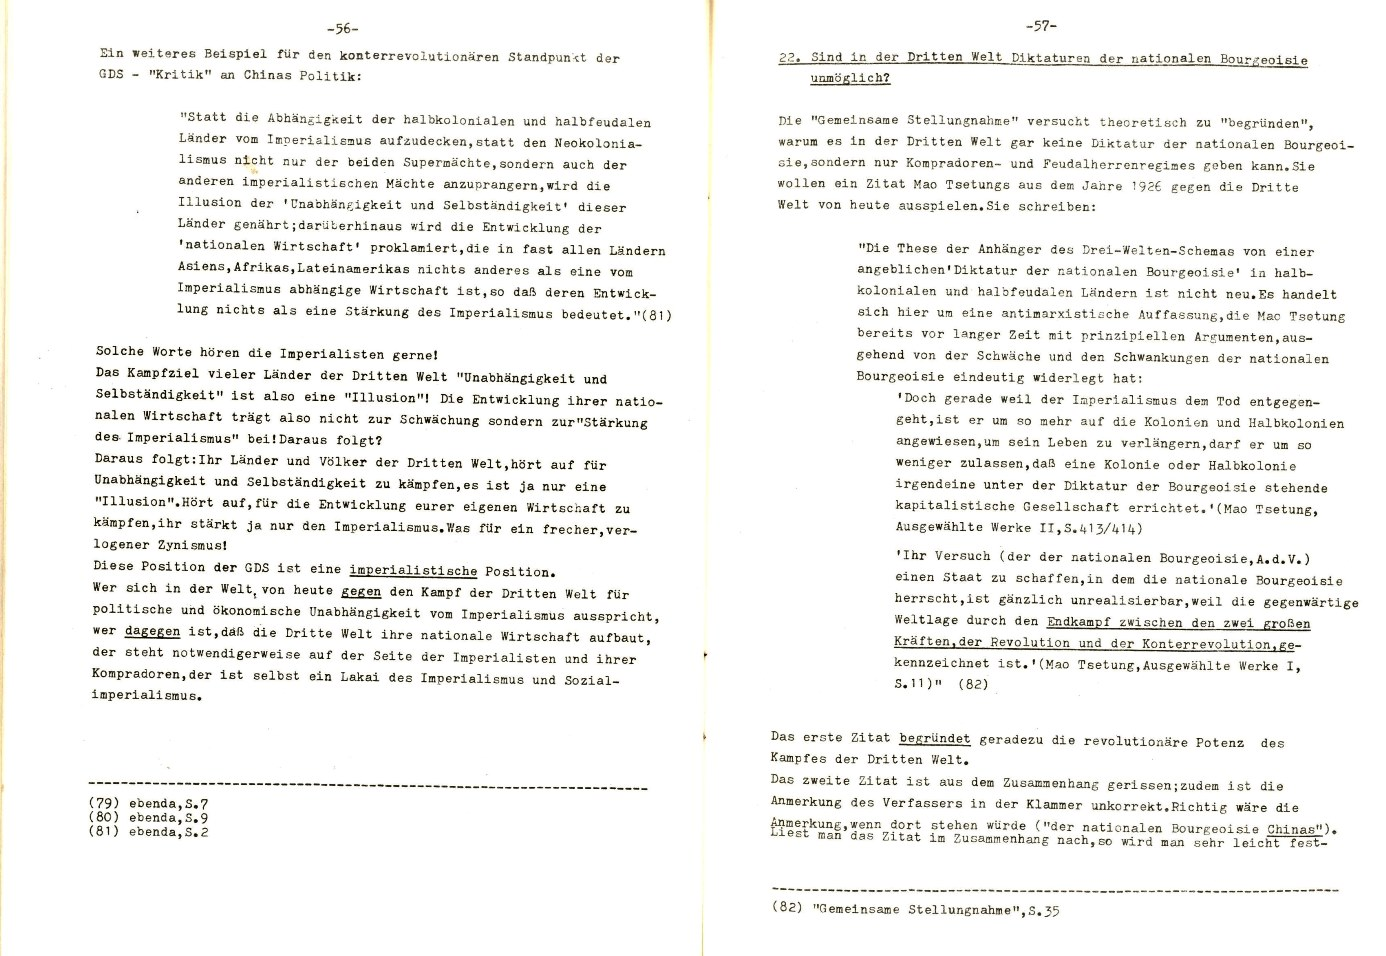 Muenchen_Kampf_dem_Revisionismus_1978_04_05_30